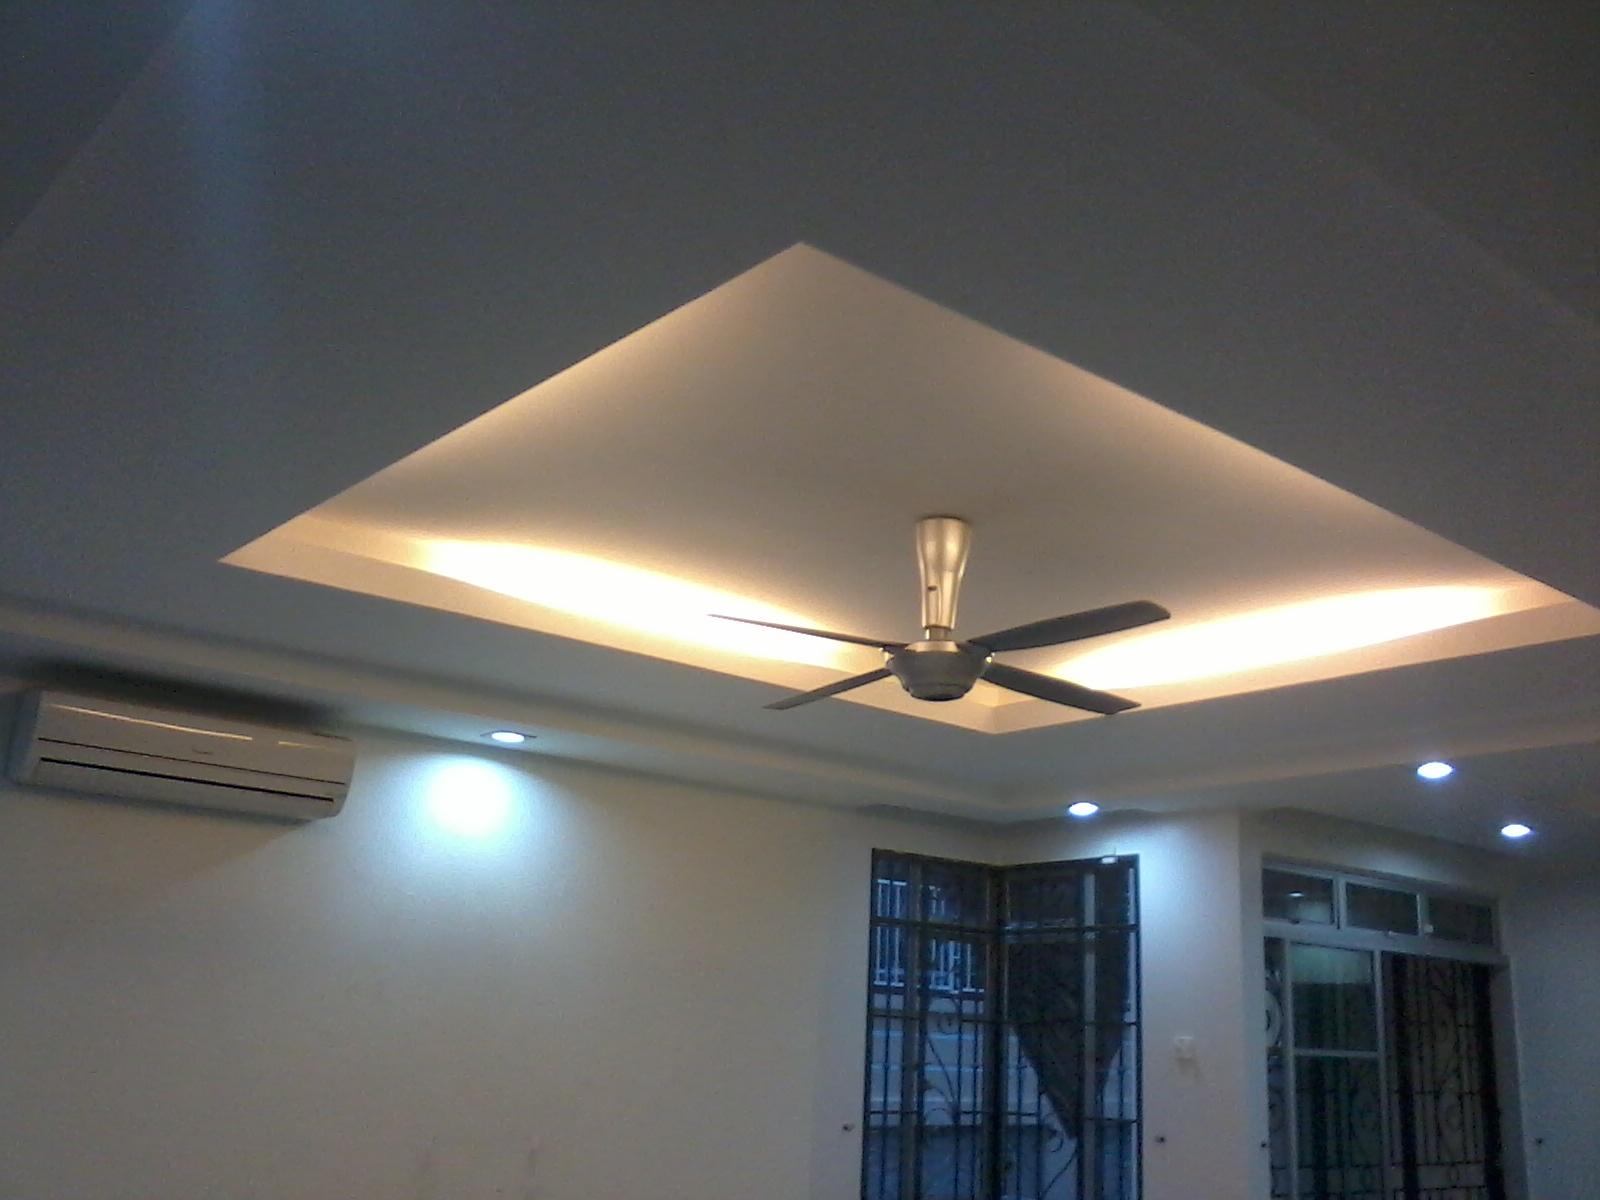 Plaster SilingSpecialist Plaster Ceiling SBDICE